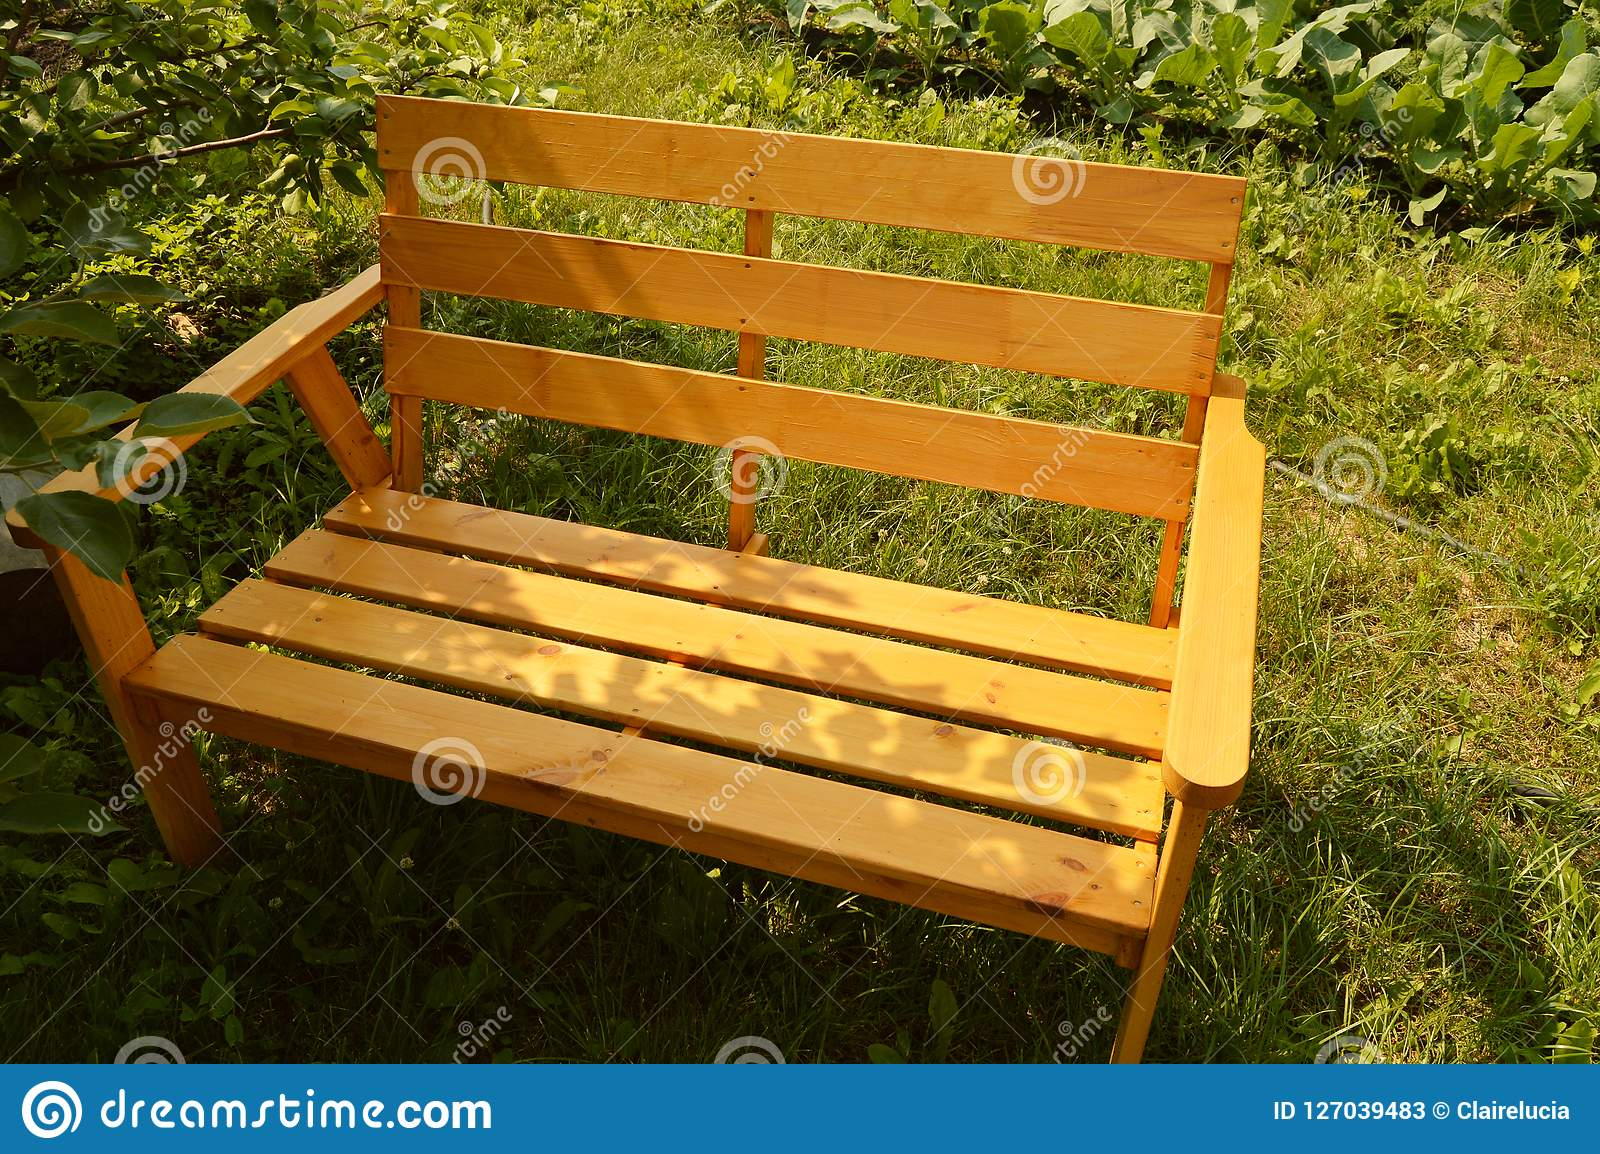 Wooden Bench In Summer Garden For Patio Design, Natural ...